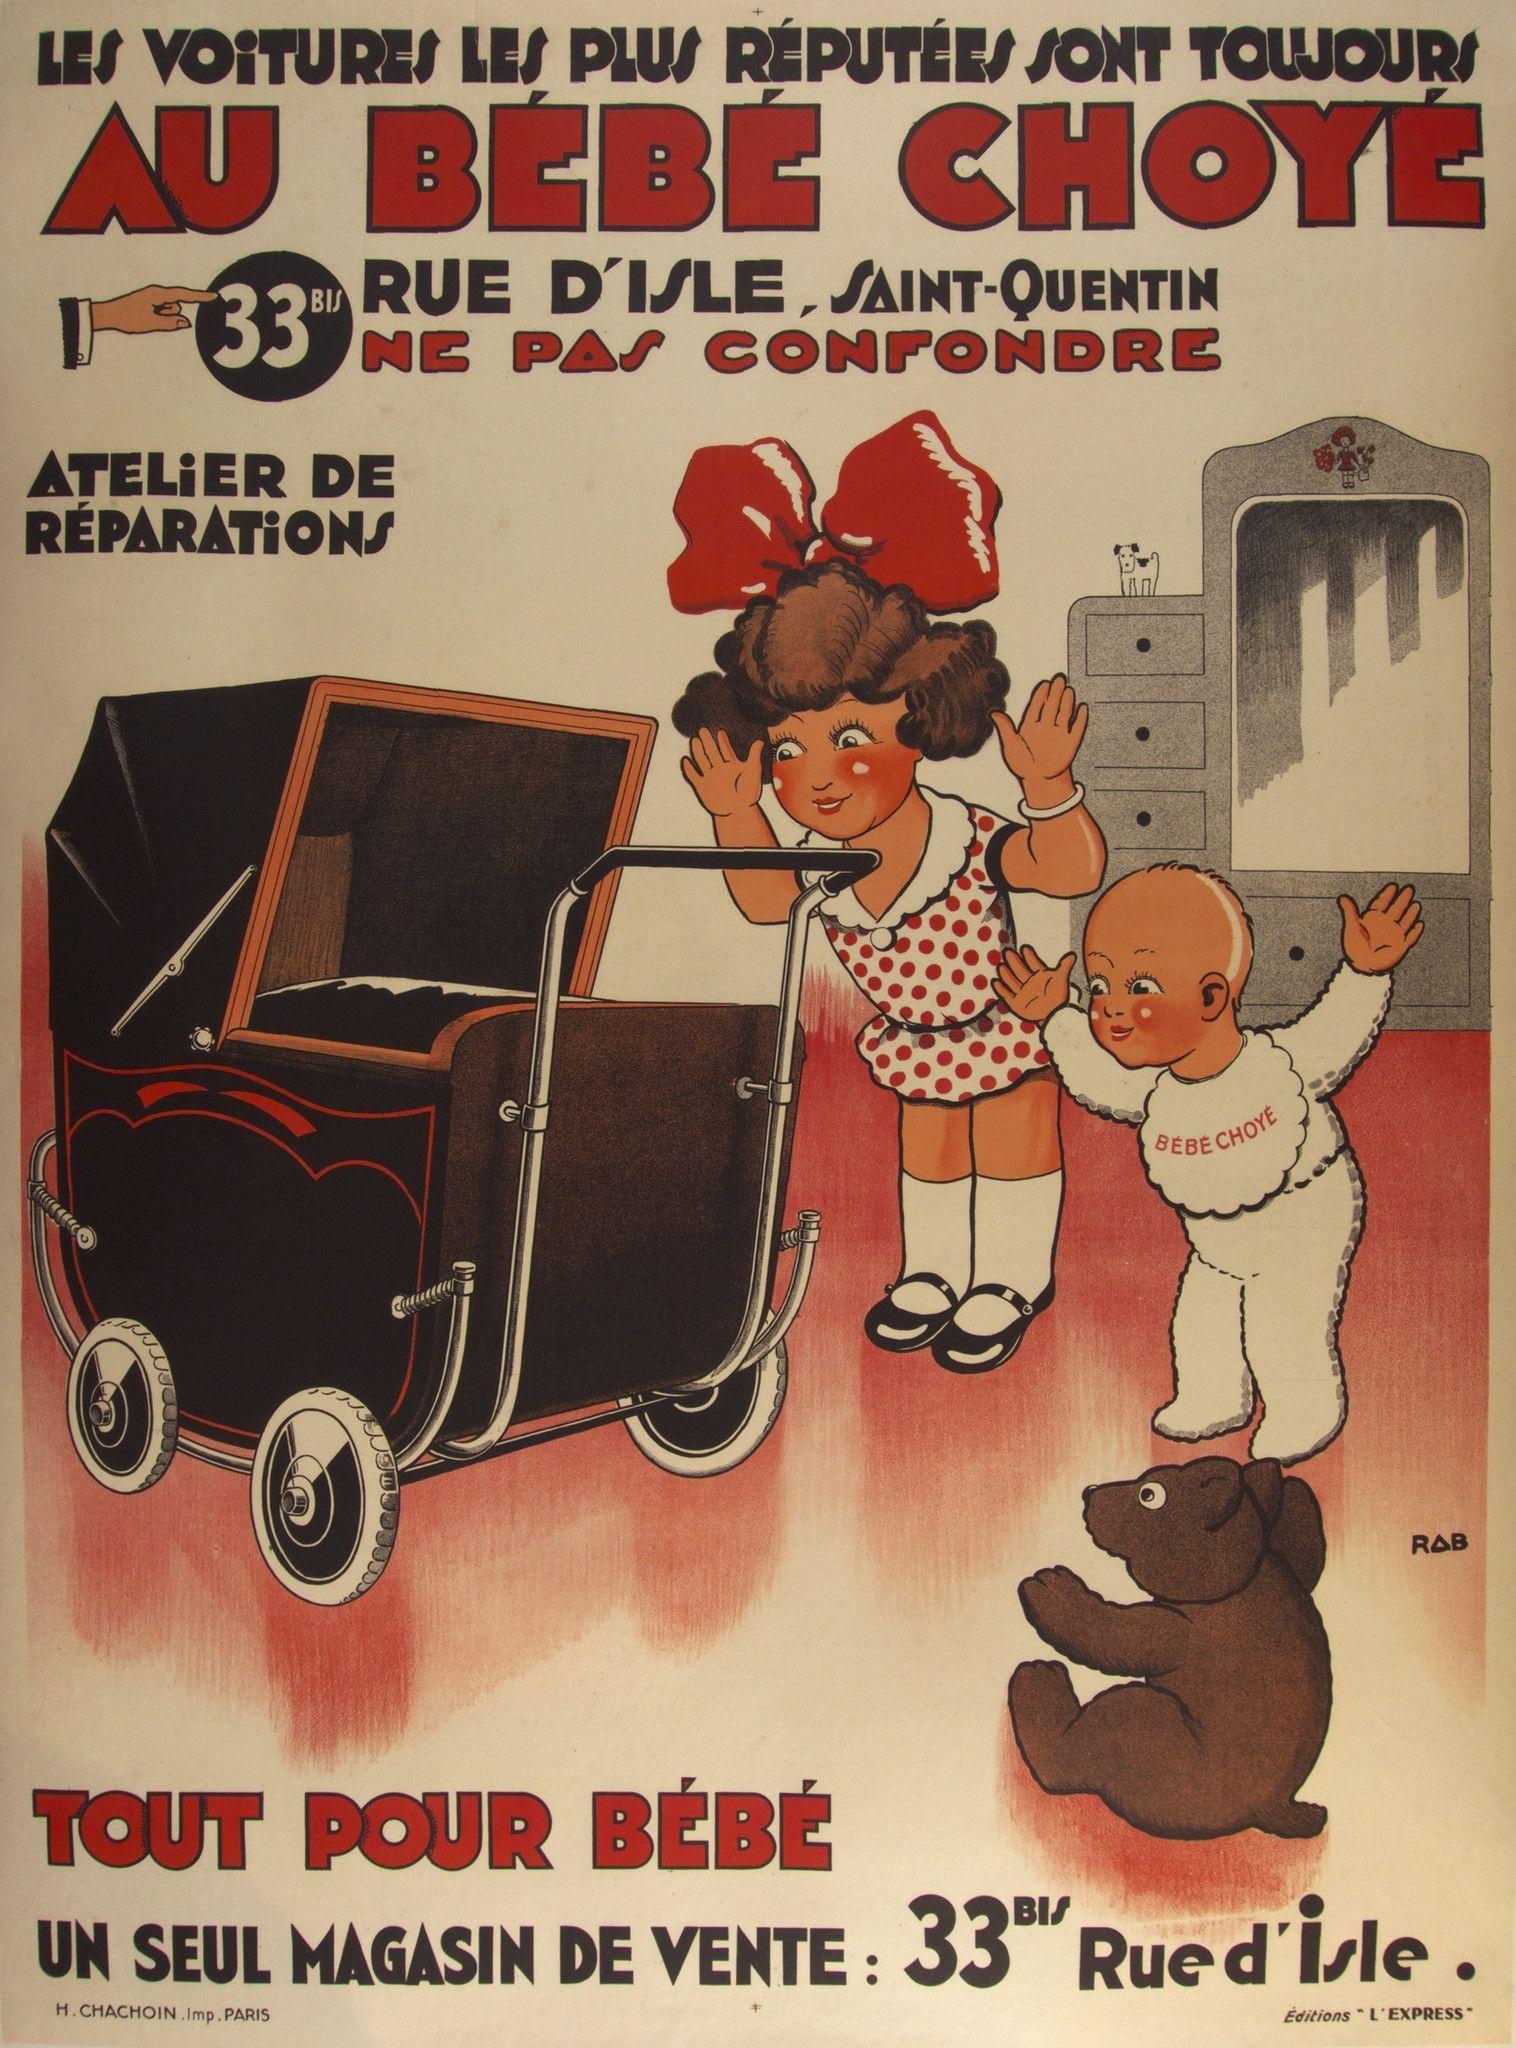 Au Bébé Choye RAB France - c. 1935